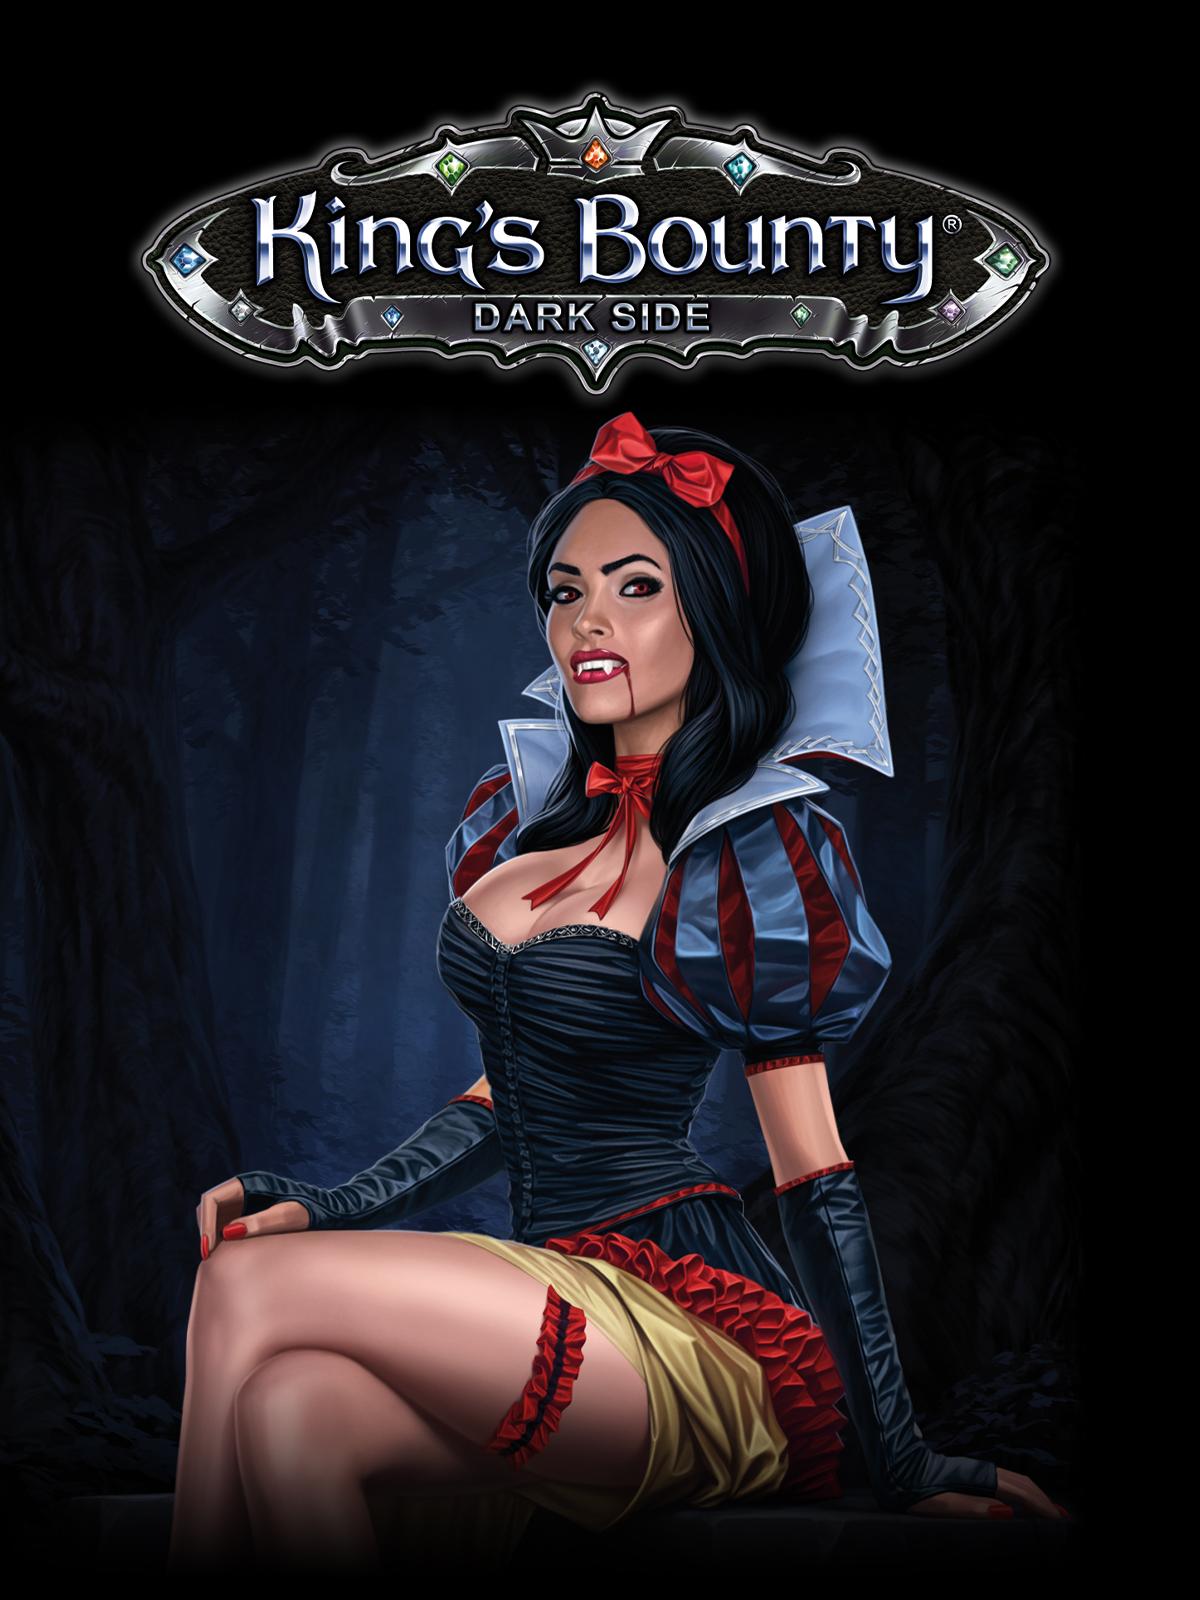 King's Bounty: Dark Side cover